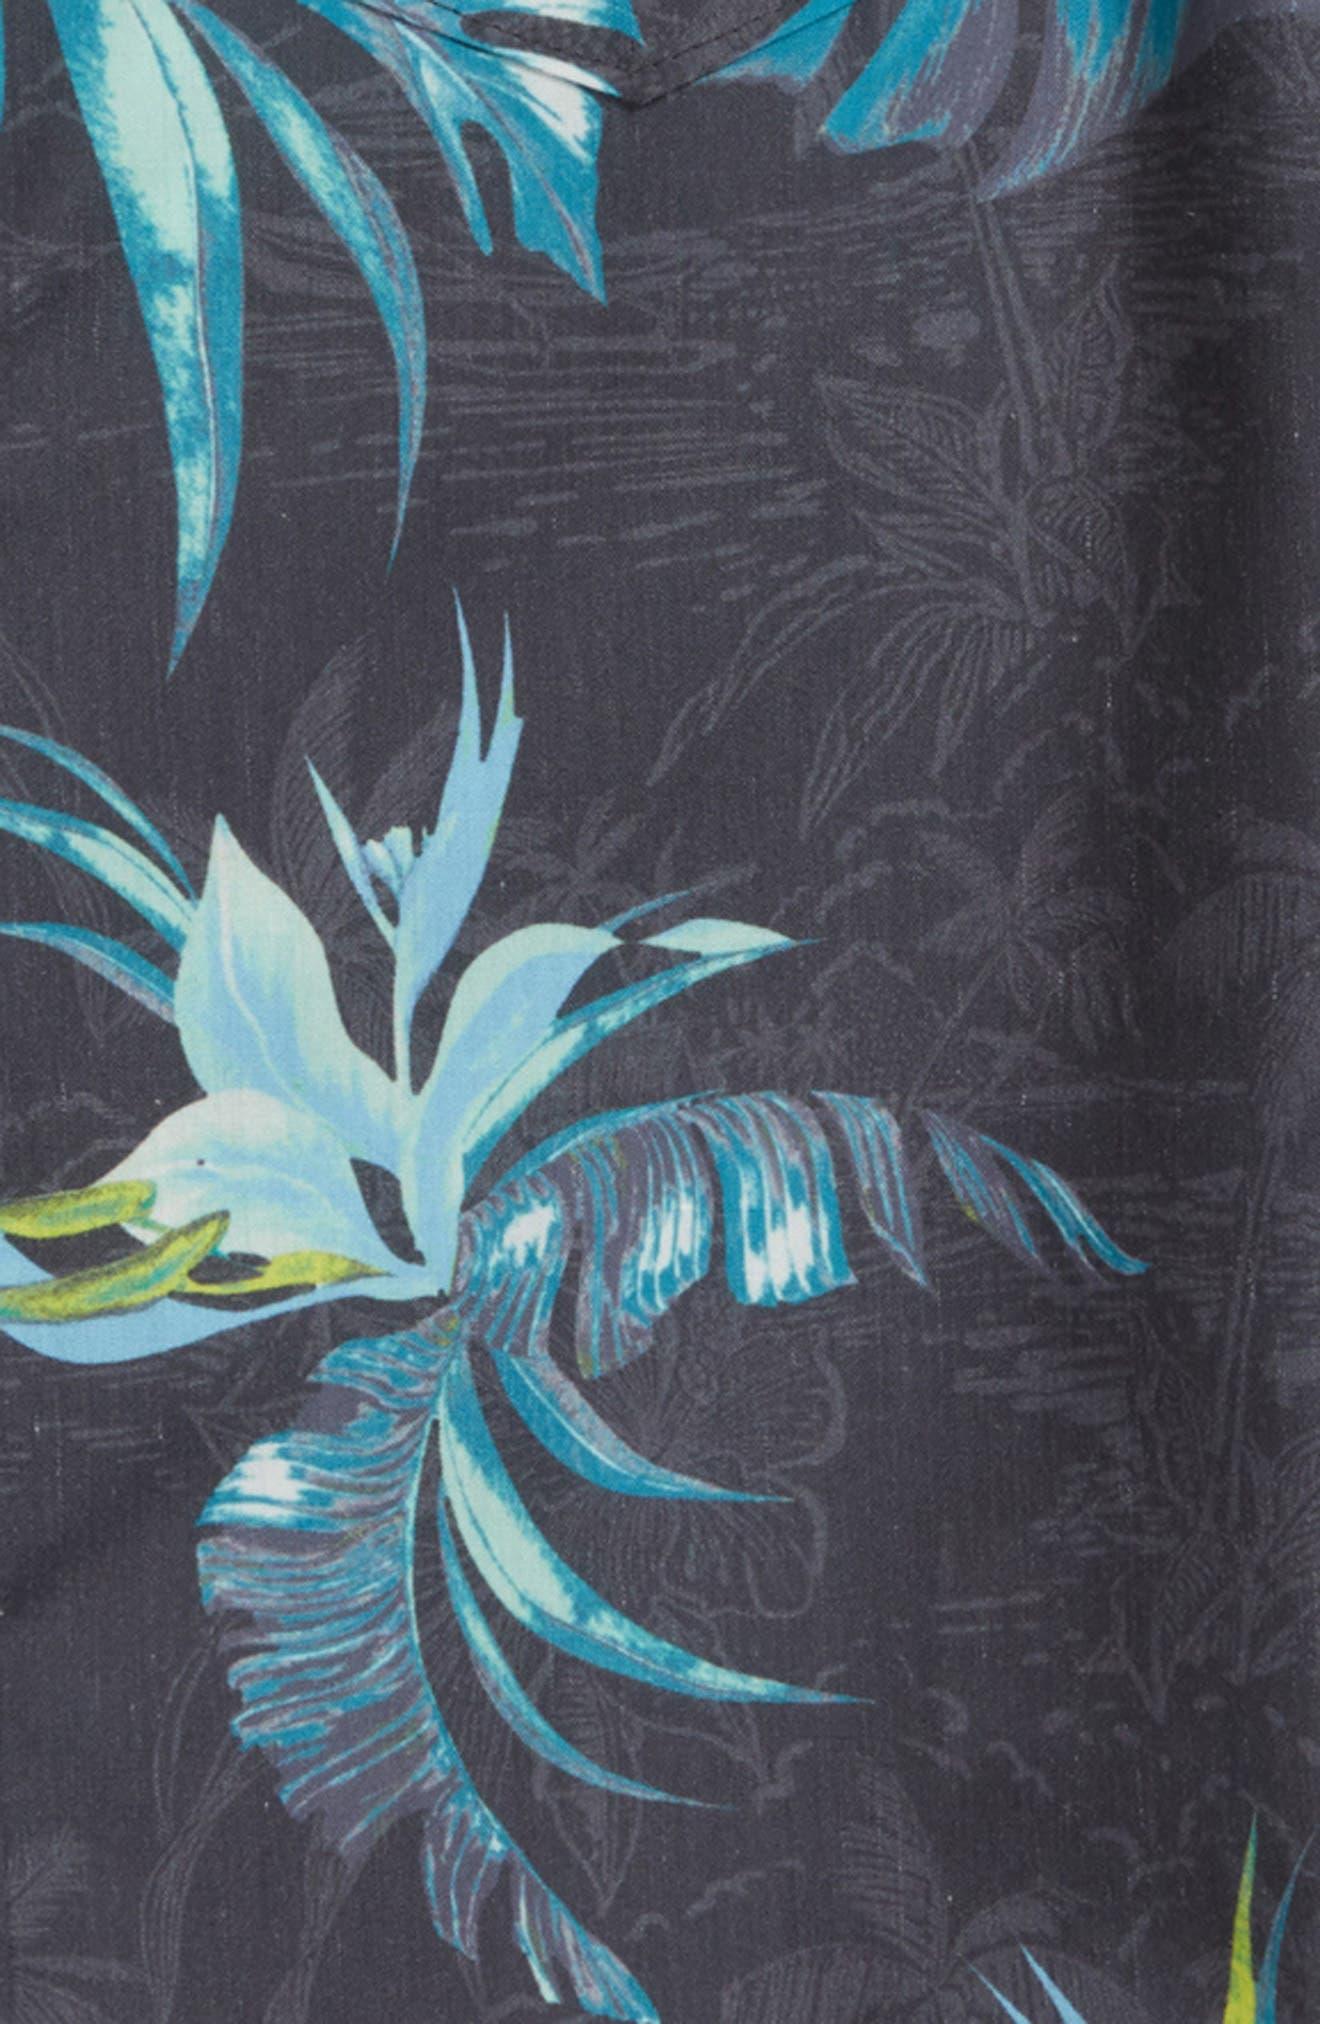 Islander Floral Print Woven Shirt,                             Alternate thumbnail 4, color,